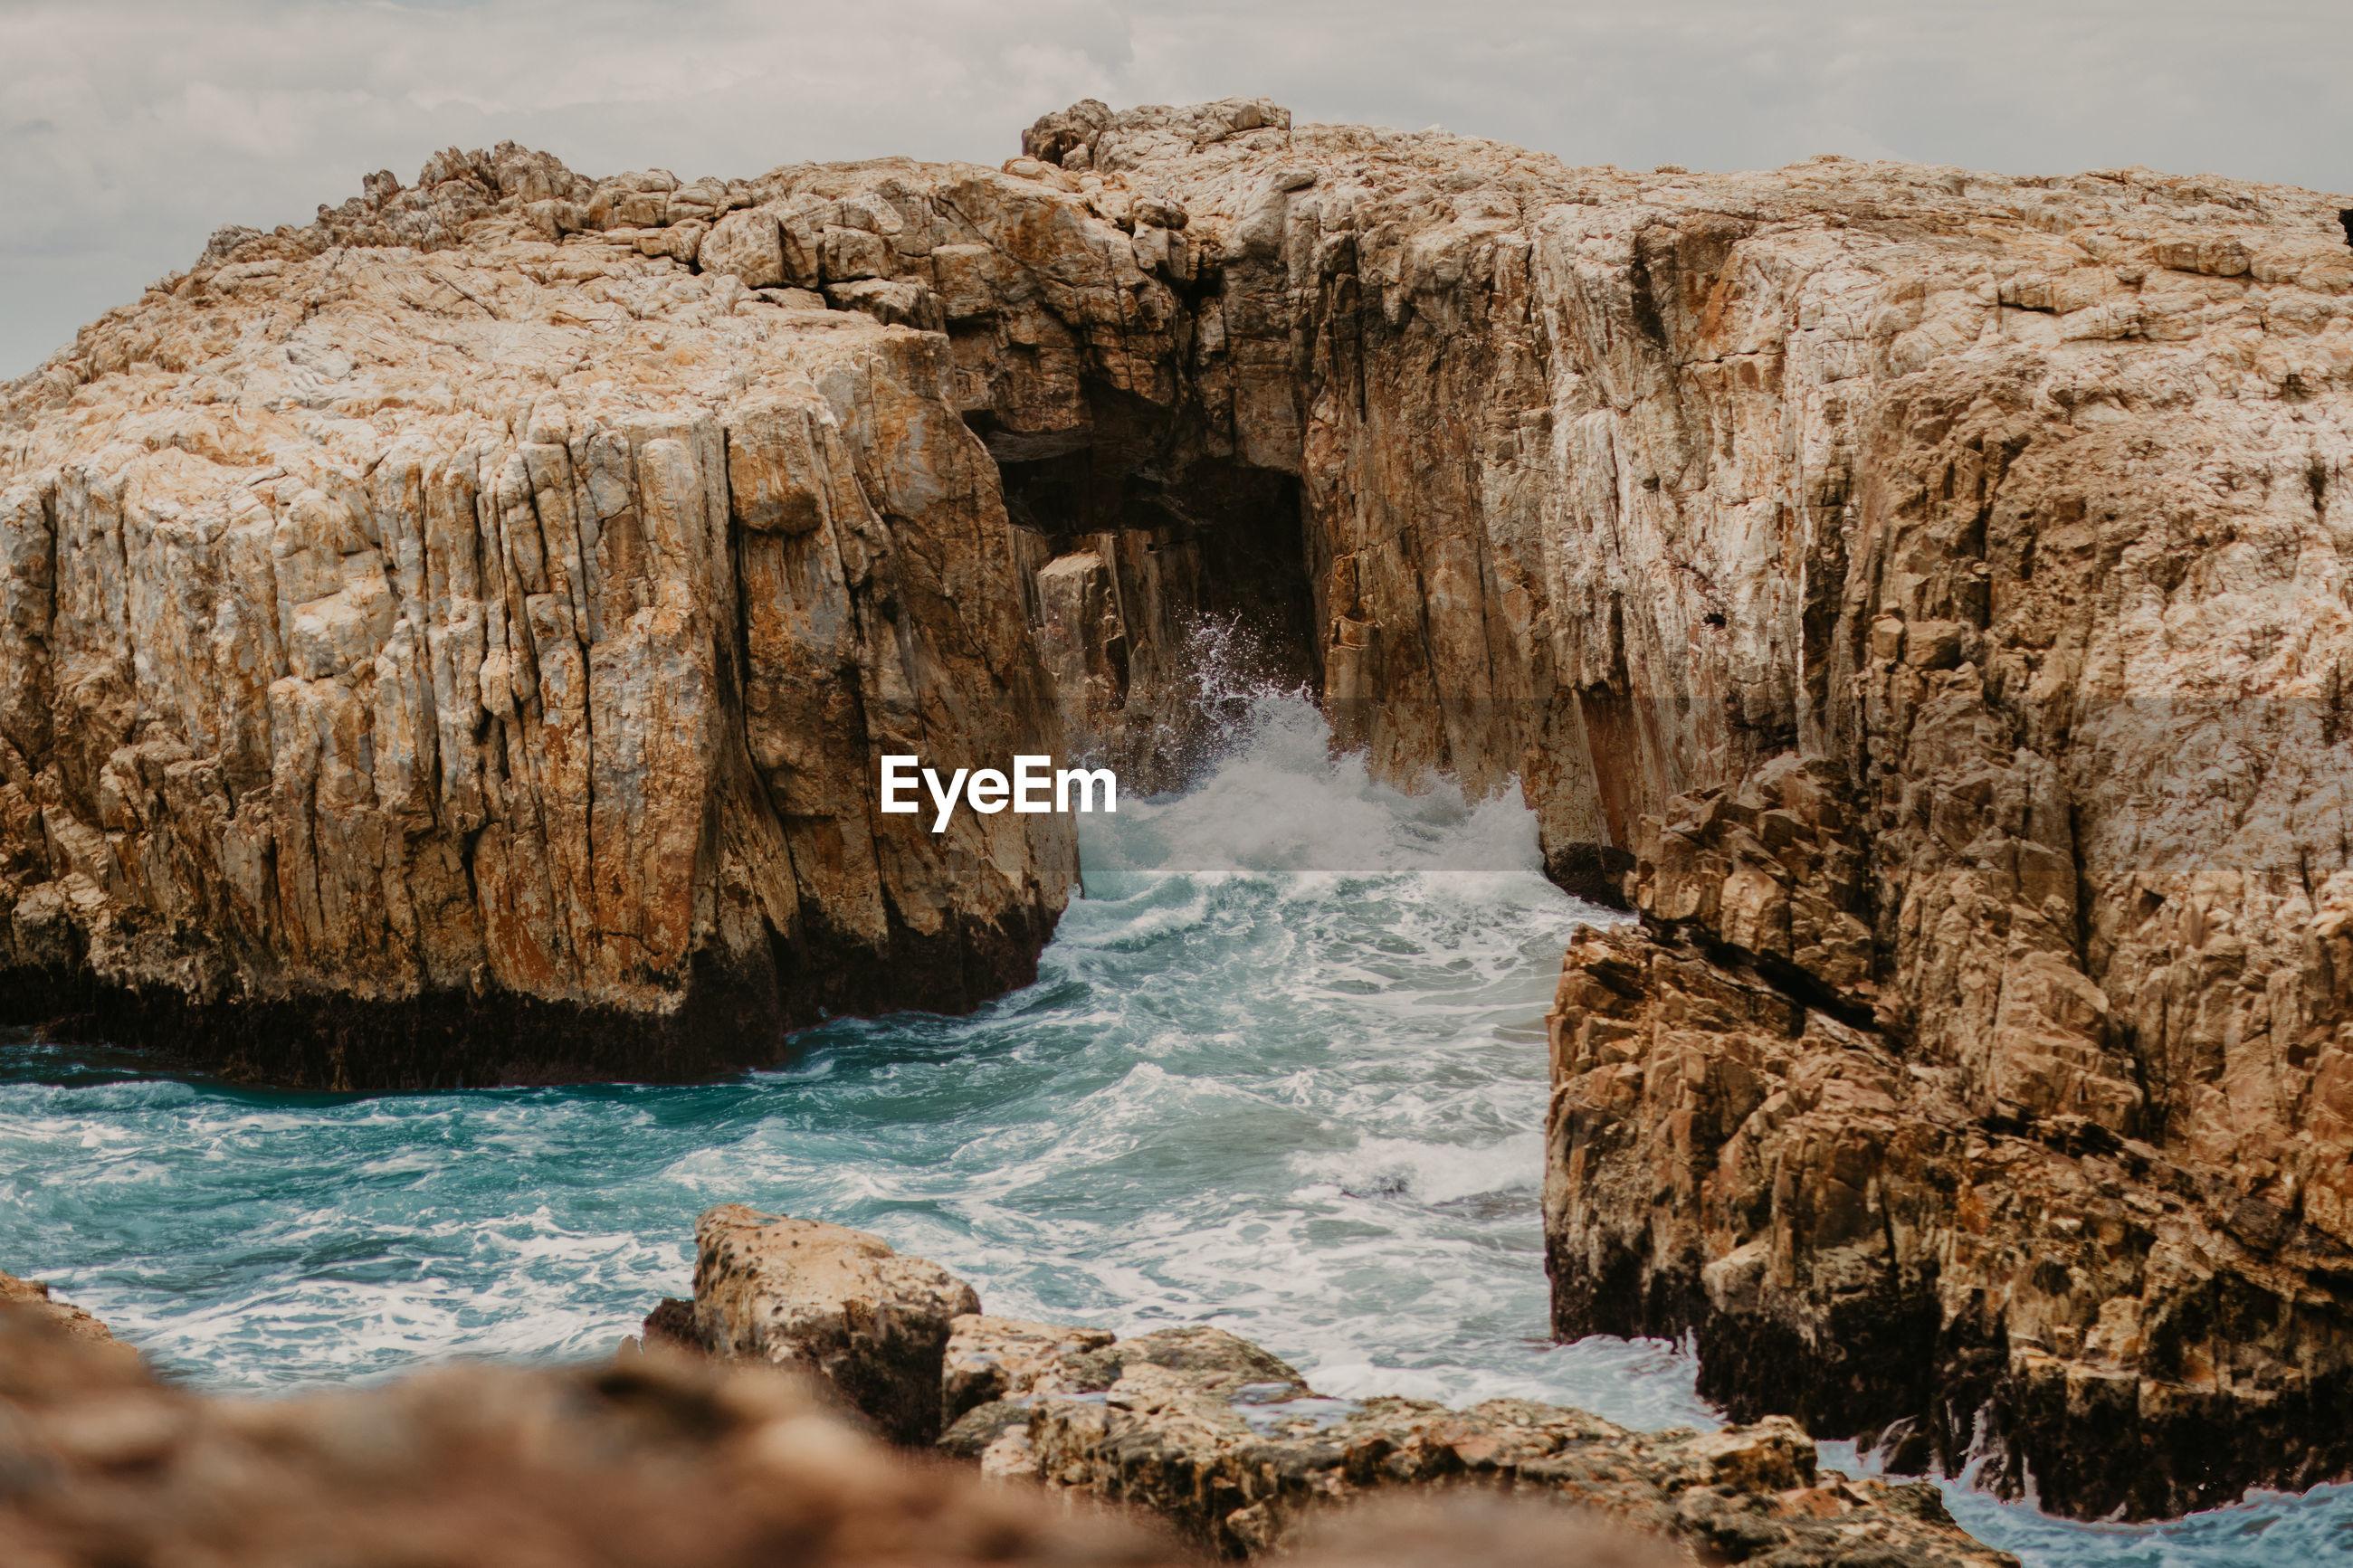 SCENIC VIEW OF ROCKS IN SEA